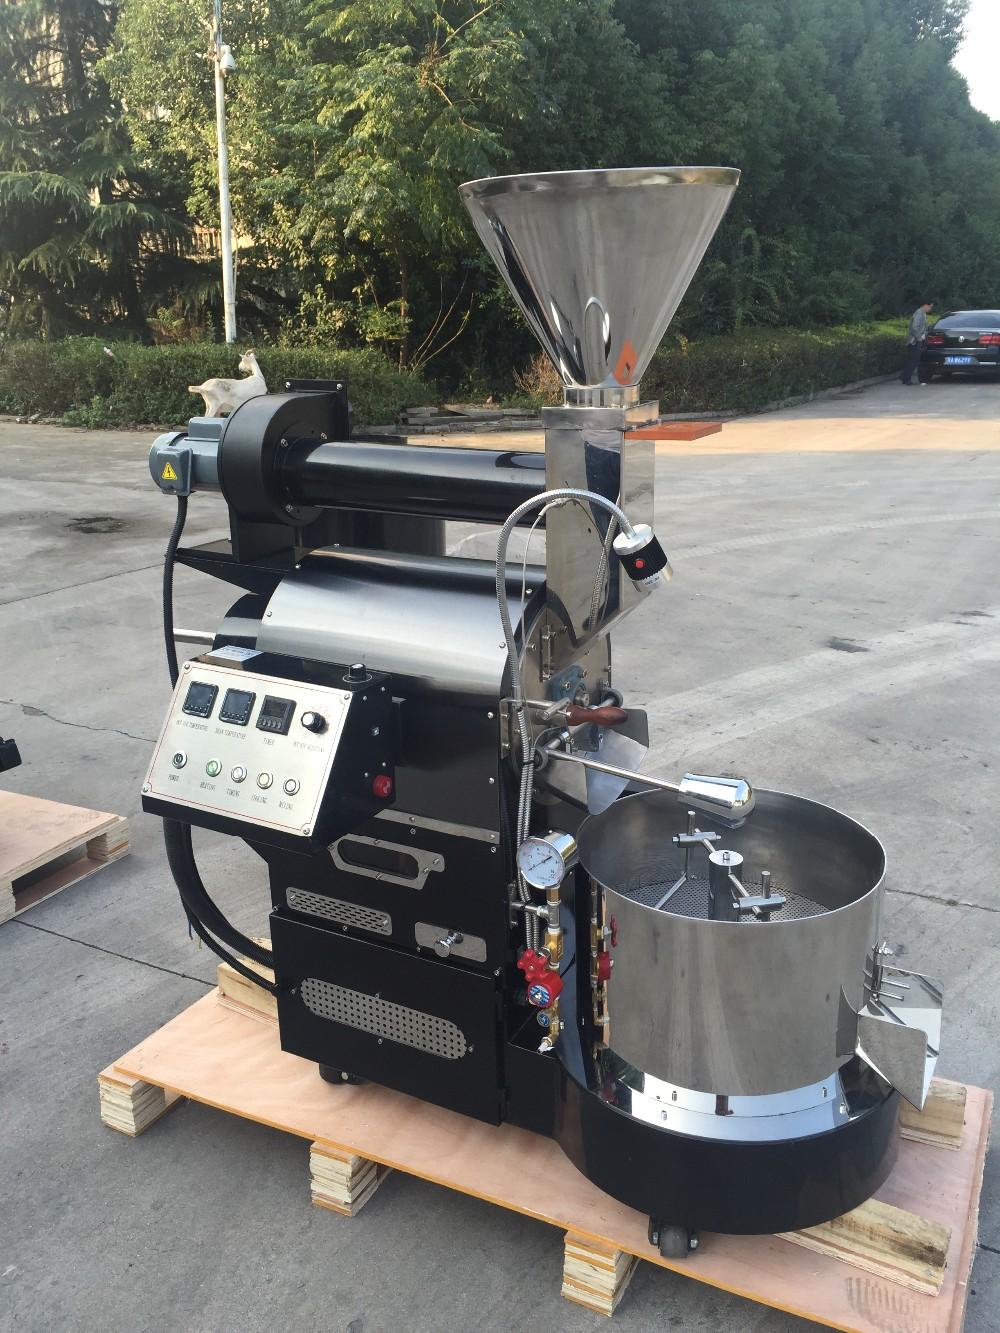 dongyi gro e f rderung 3 kg gasheizung original edelstahl automatische kaffeer ster preis. Black Bedroom Furniture Sets. Home Design Ideas